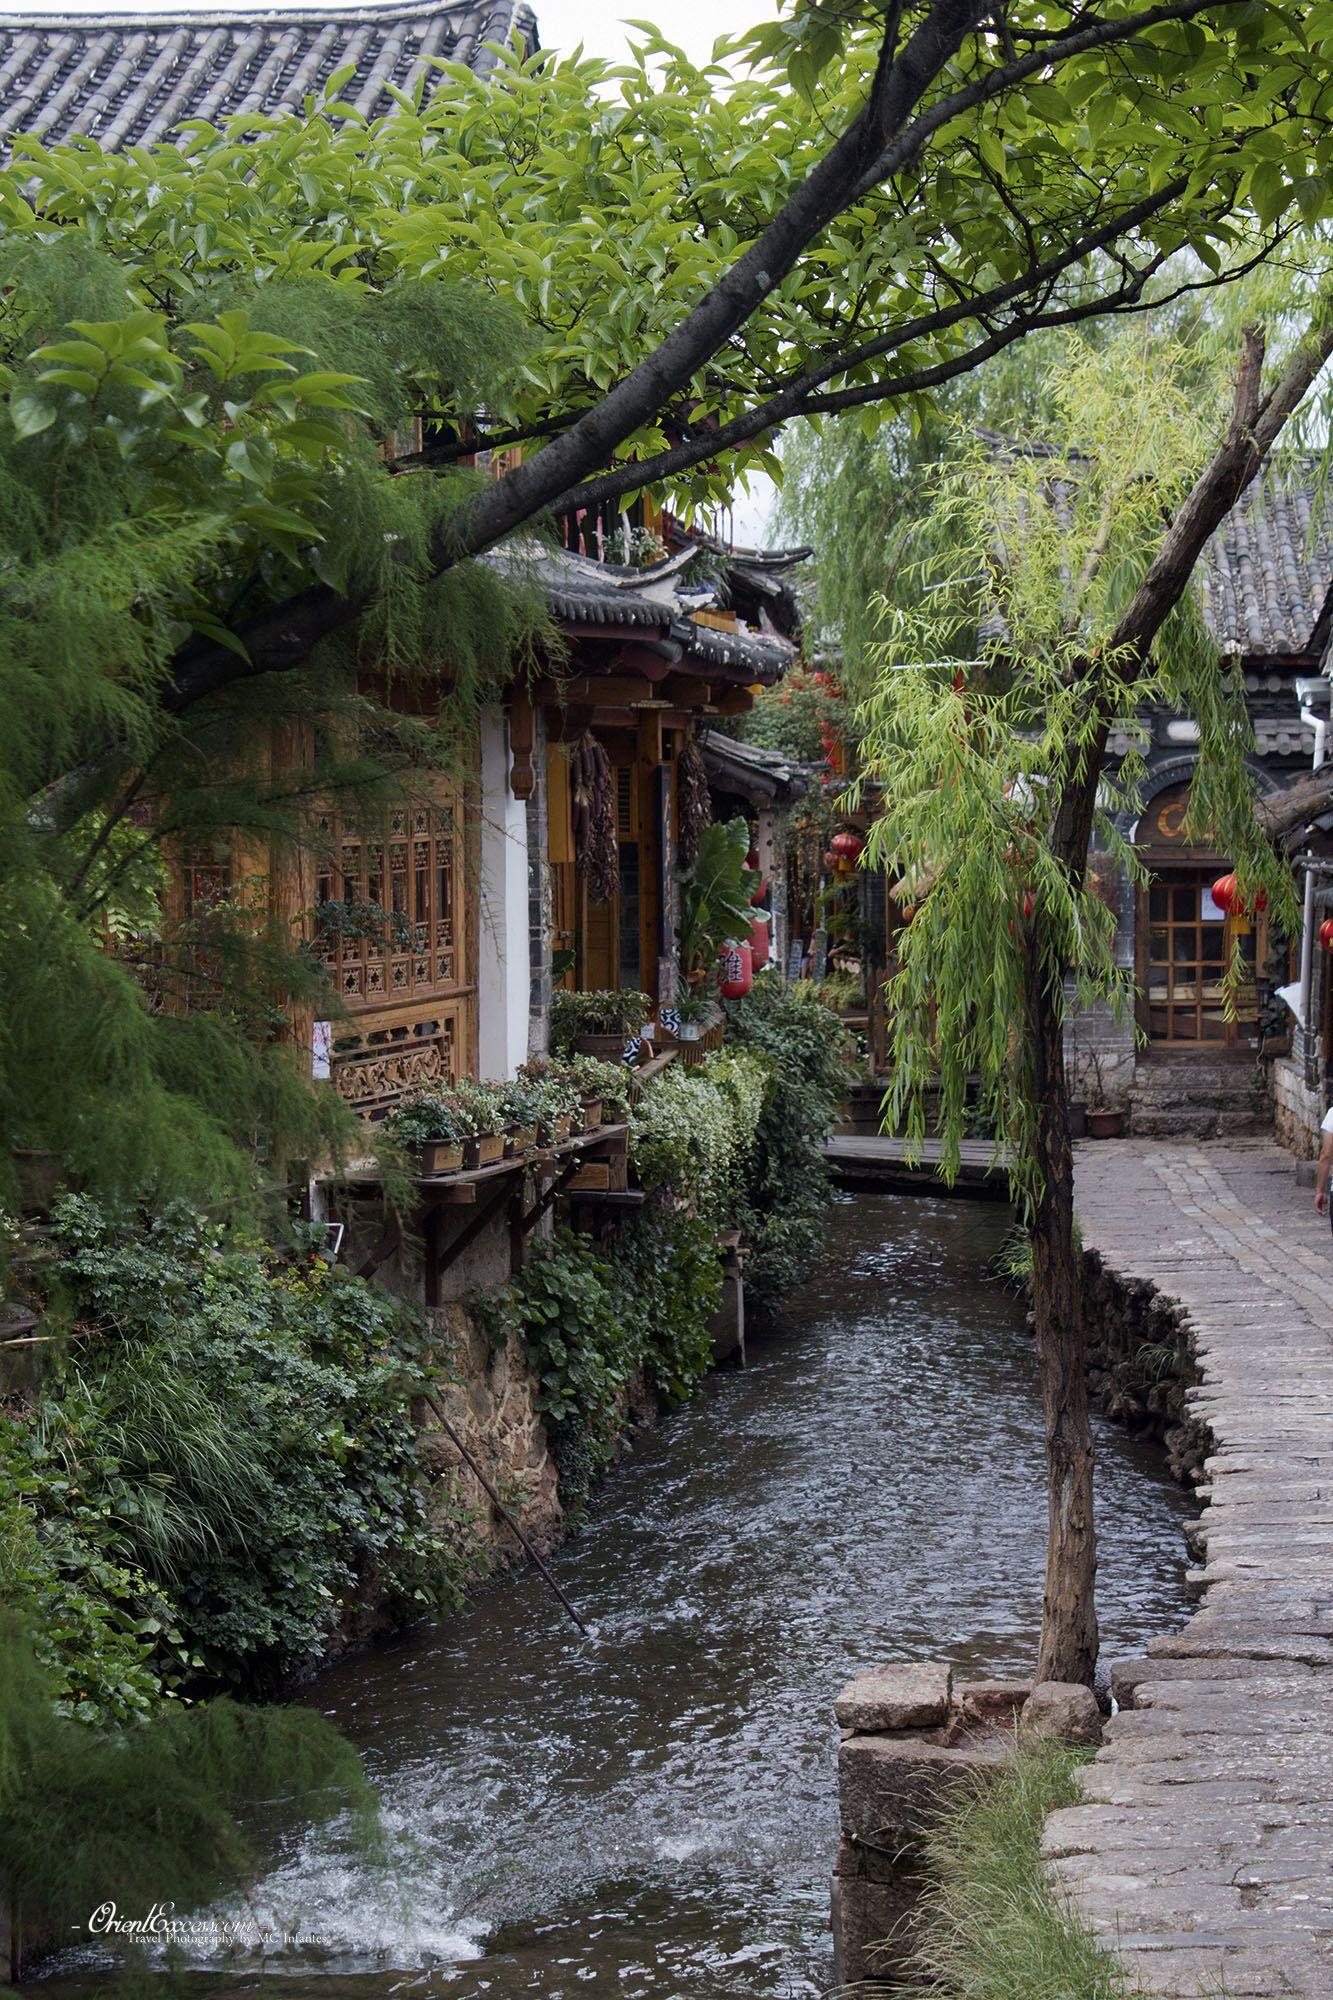 Street Of Lijiang In Yunnan 風景 中国庭園 旅行参考イメージまとめ